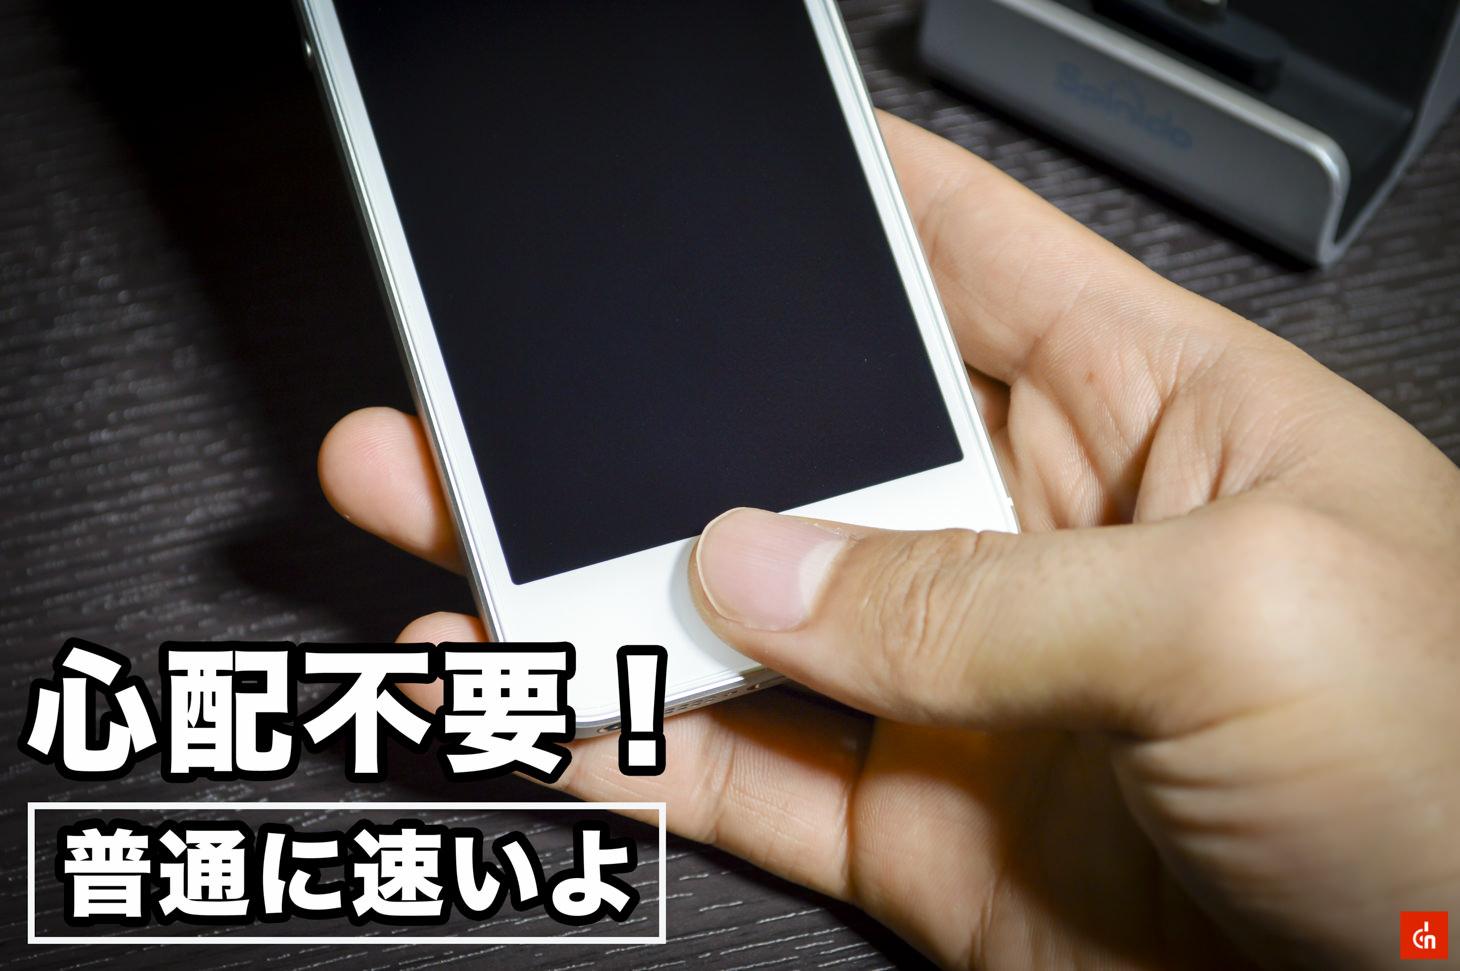 002_20160505_iphone-se-touchid-response